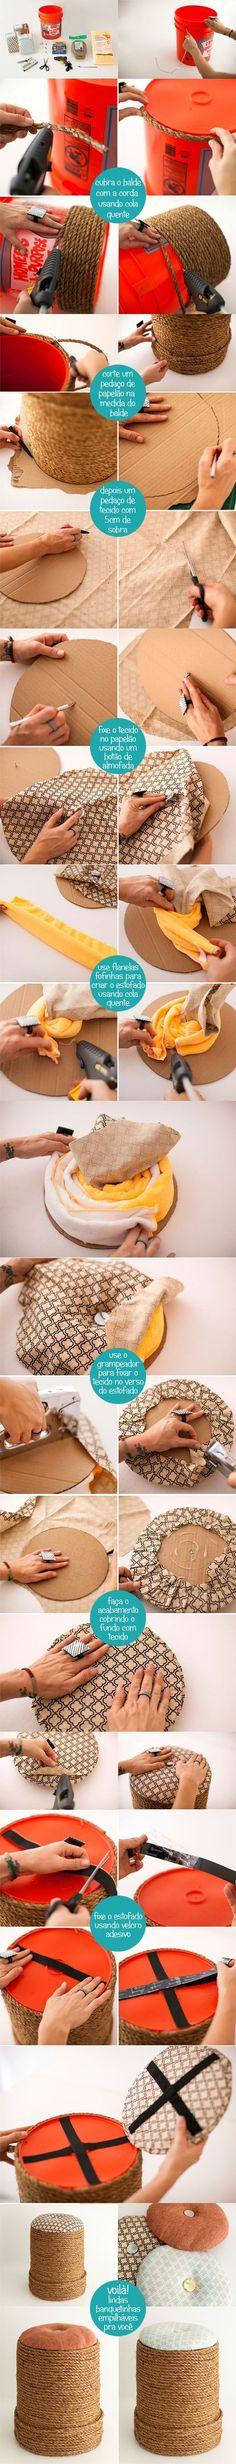 DIY – Passo a Passo: Baldes de plástico viram banquetas. |: